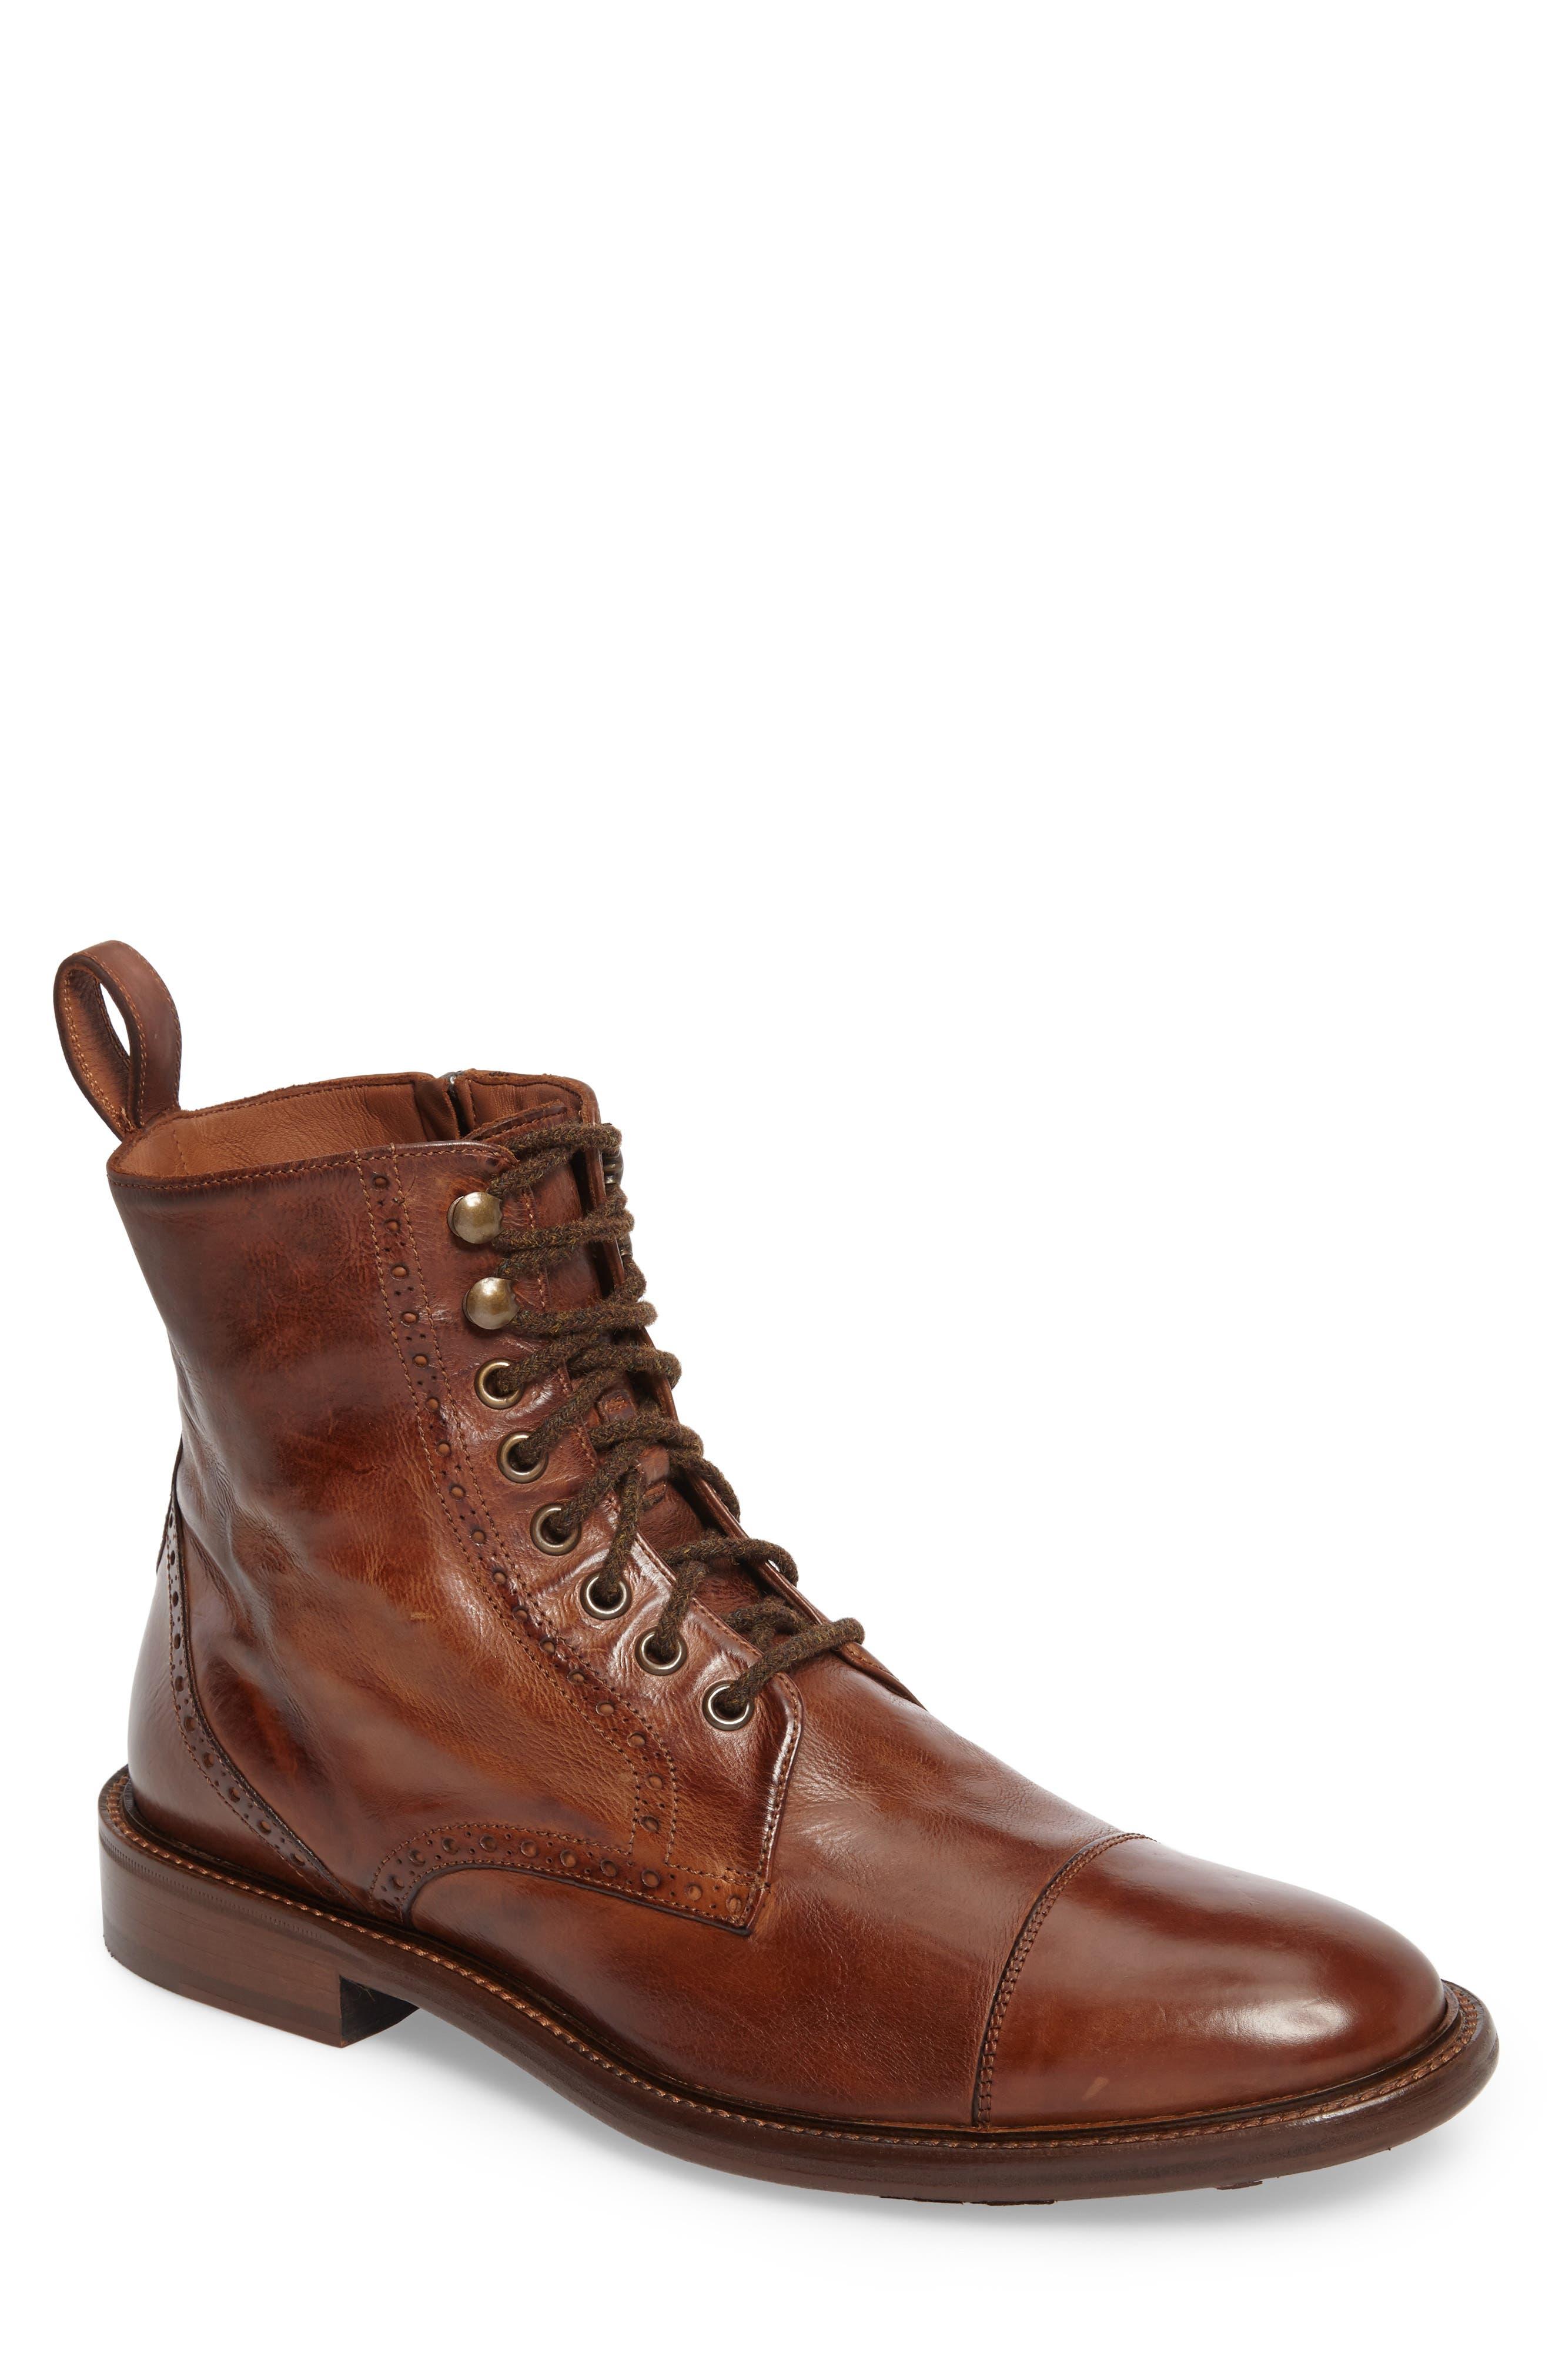 Bryson Cap Toe Boot,                         Main,                         color, Mahogany Leather